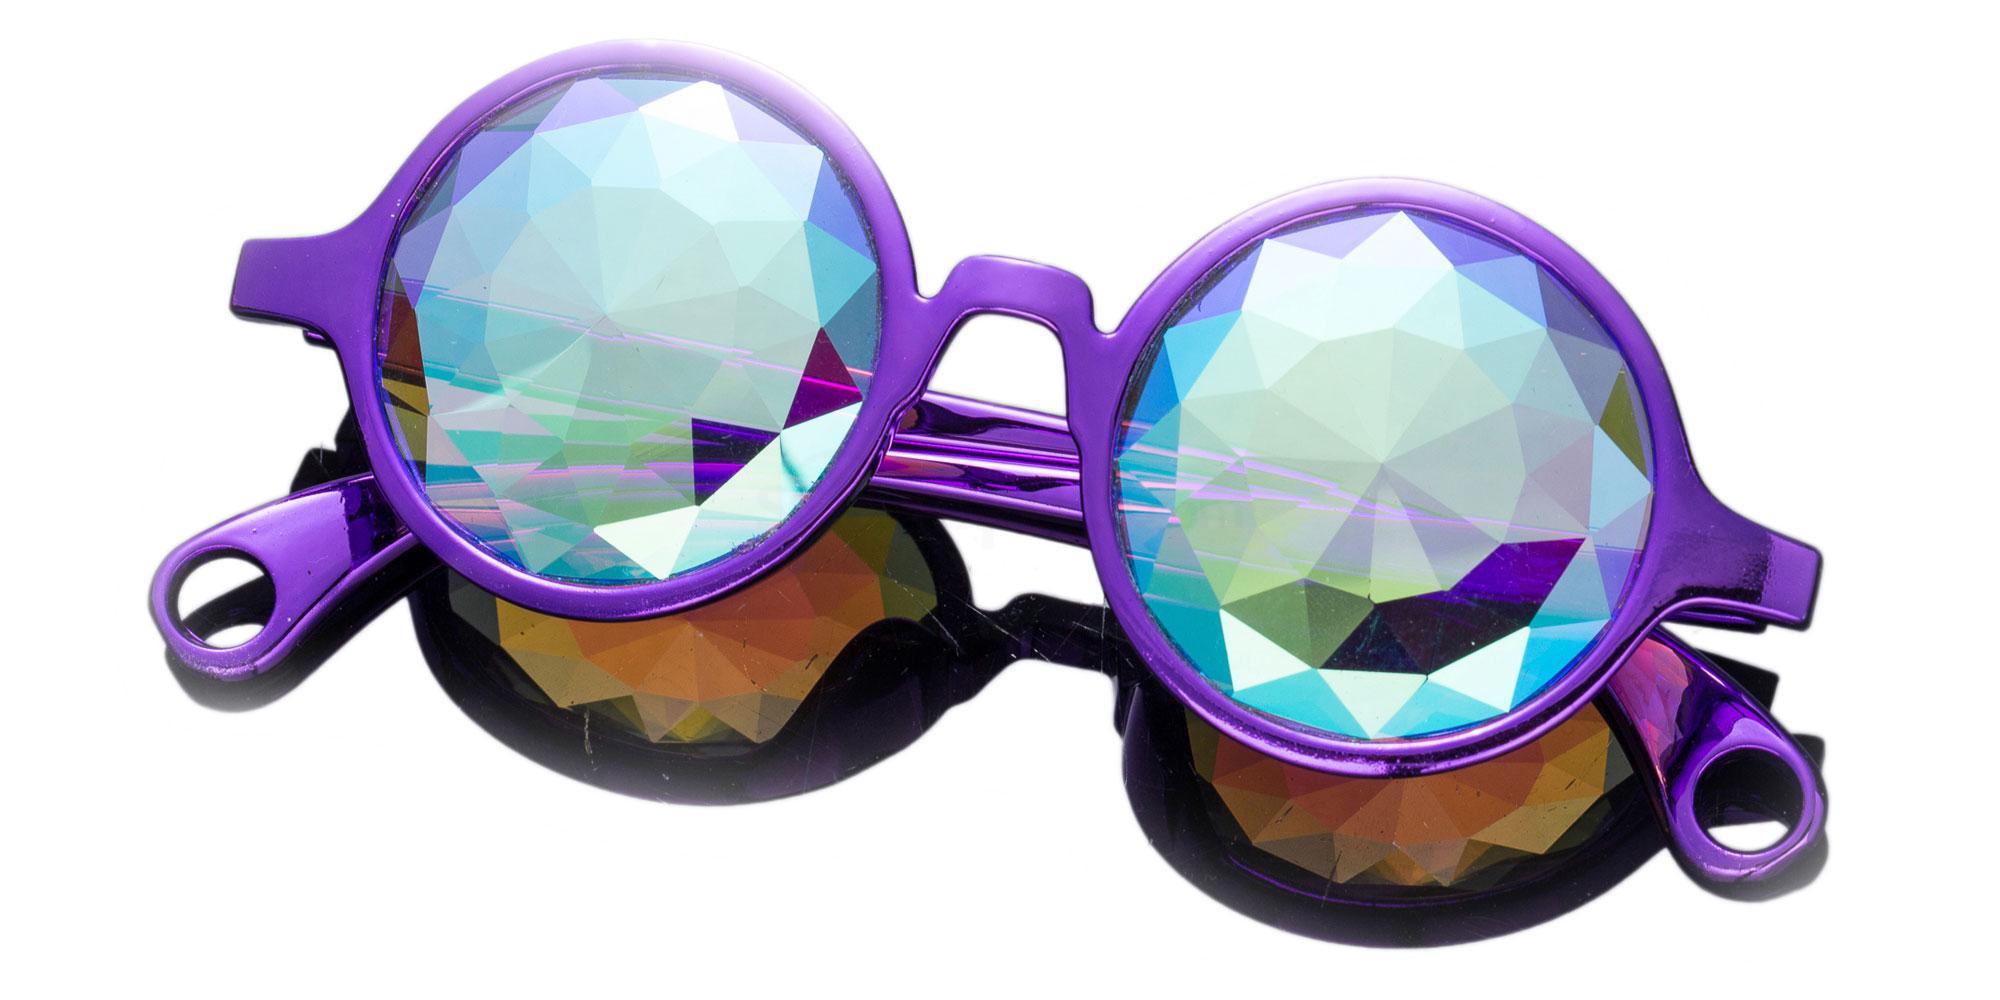 Light purple Round Style Frame / Small Diamond Rainbow Lense 1004K-24 Accessories, Kolor Kaleido